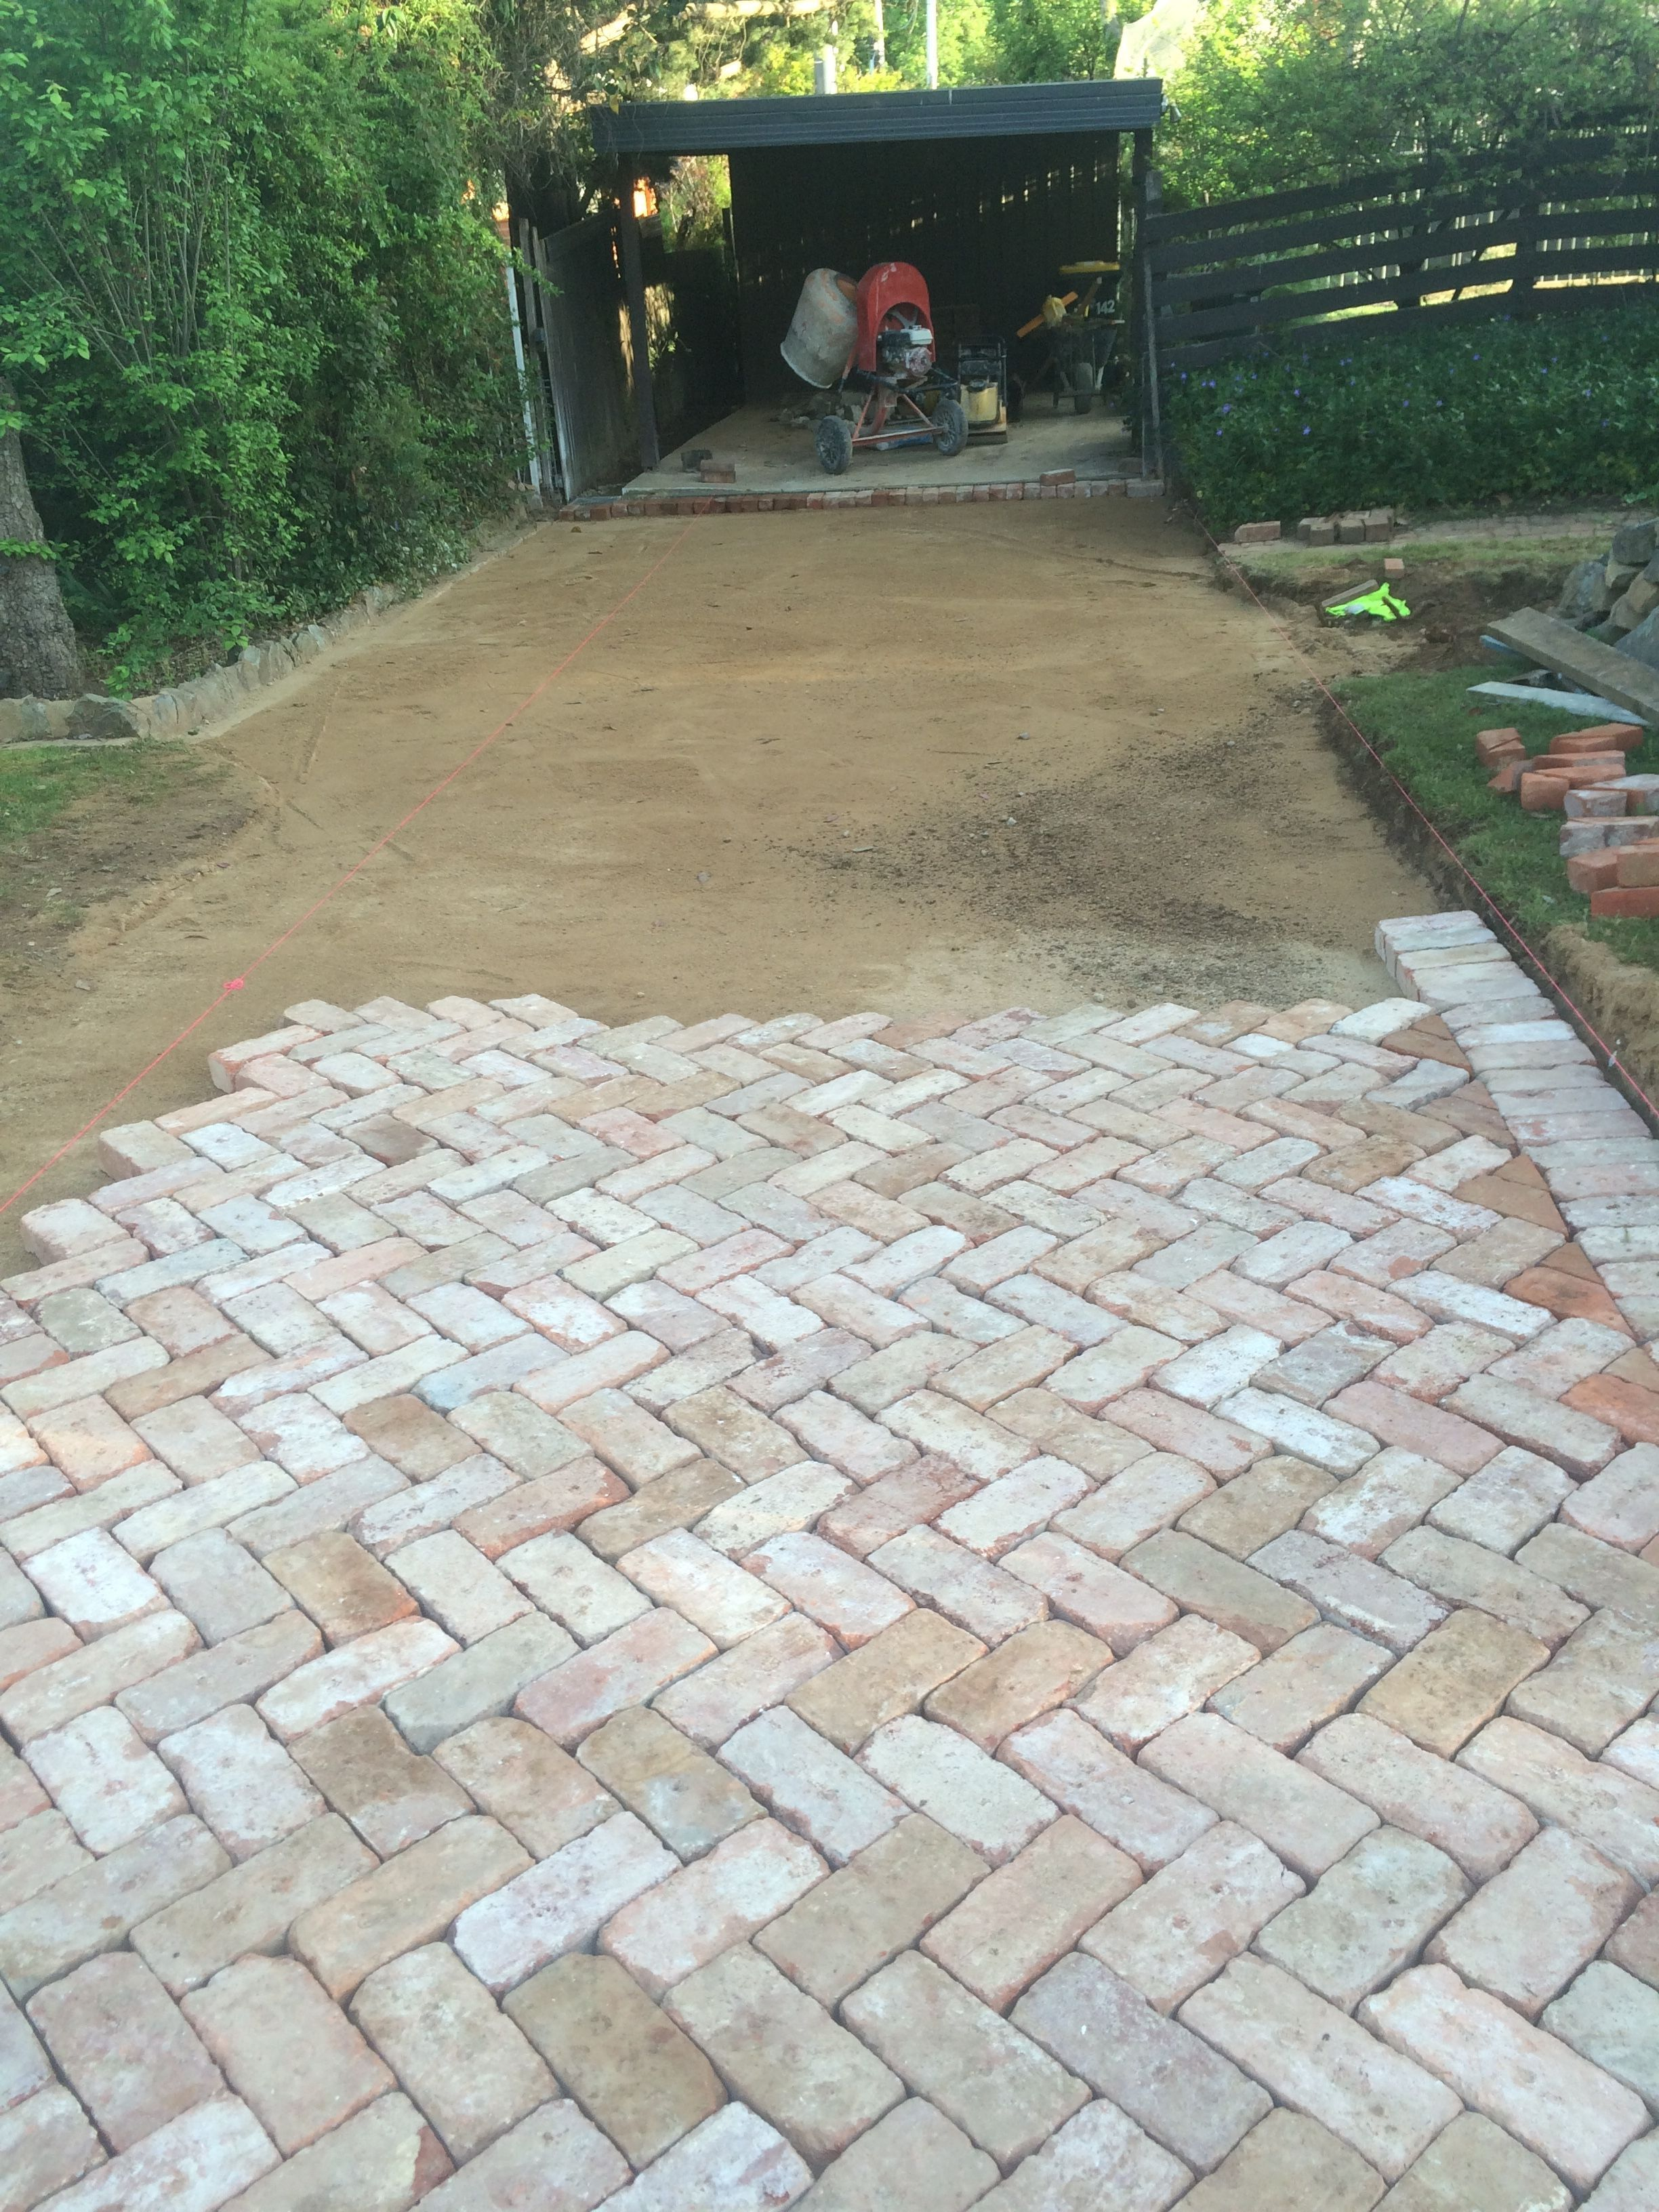 Pin by Joni StufflebeanSolomon on Curb Appeal in 2019  Brick driveway Brick paver patio